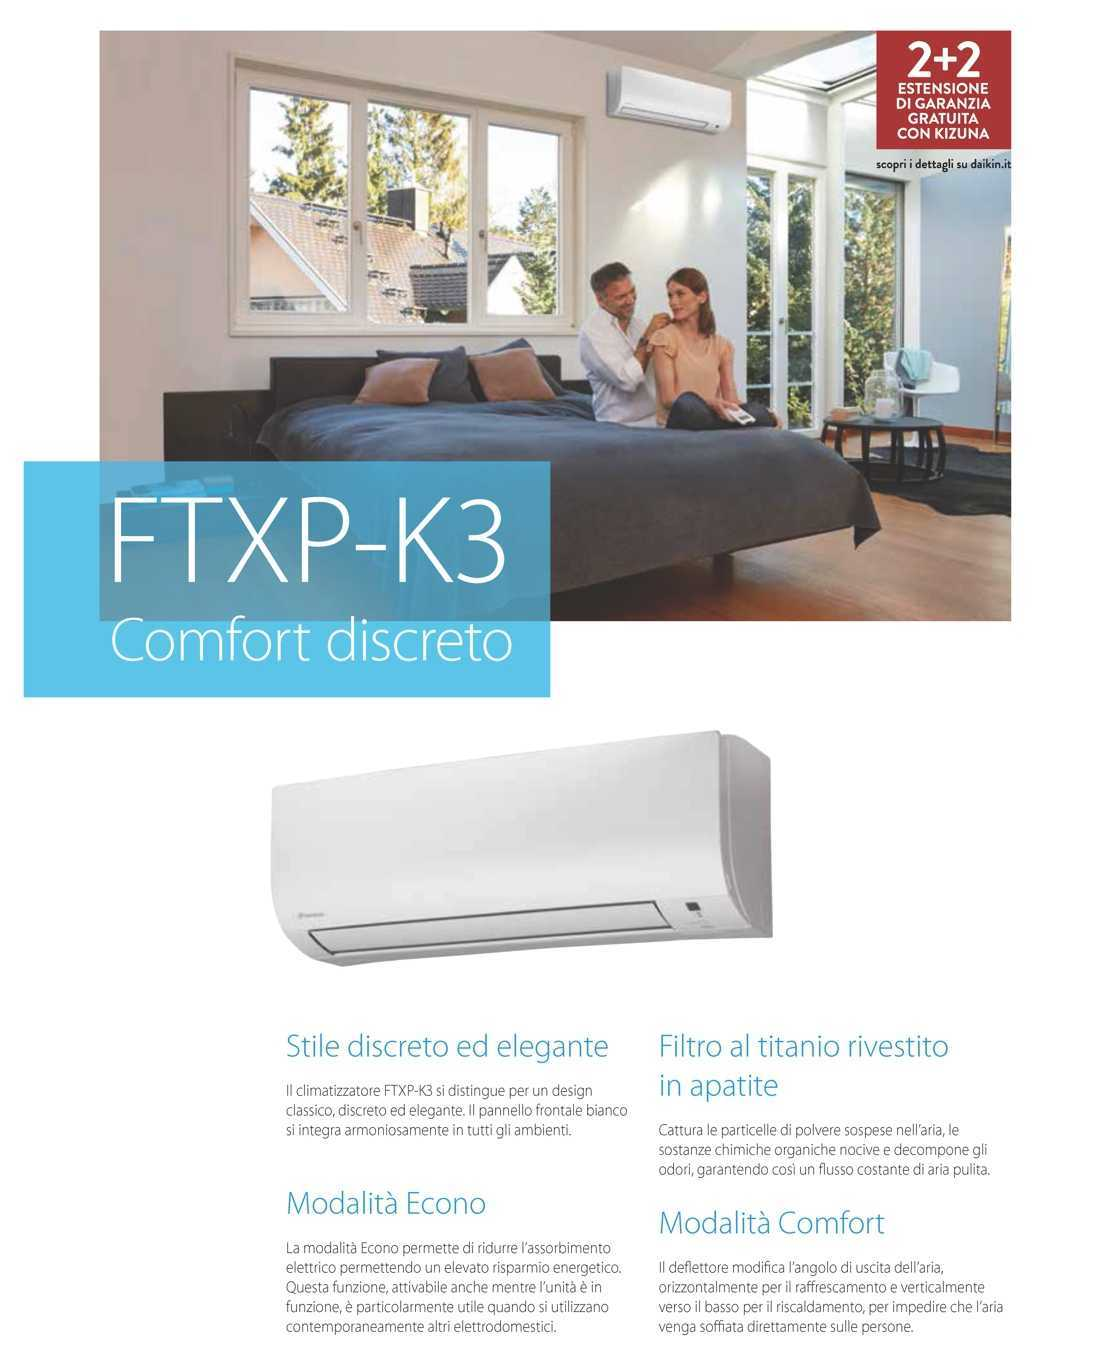 Condizionatore Daikin Mono Split 18000 Btu Serie FTXP-K3 A++/A+